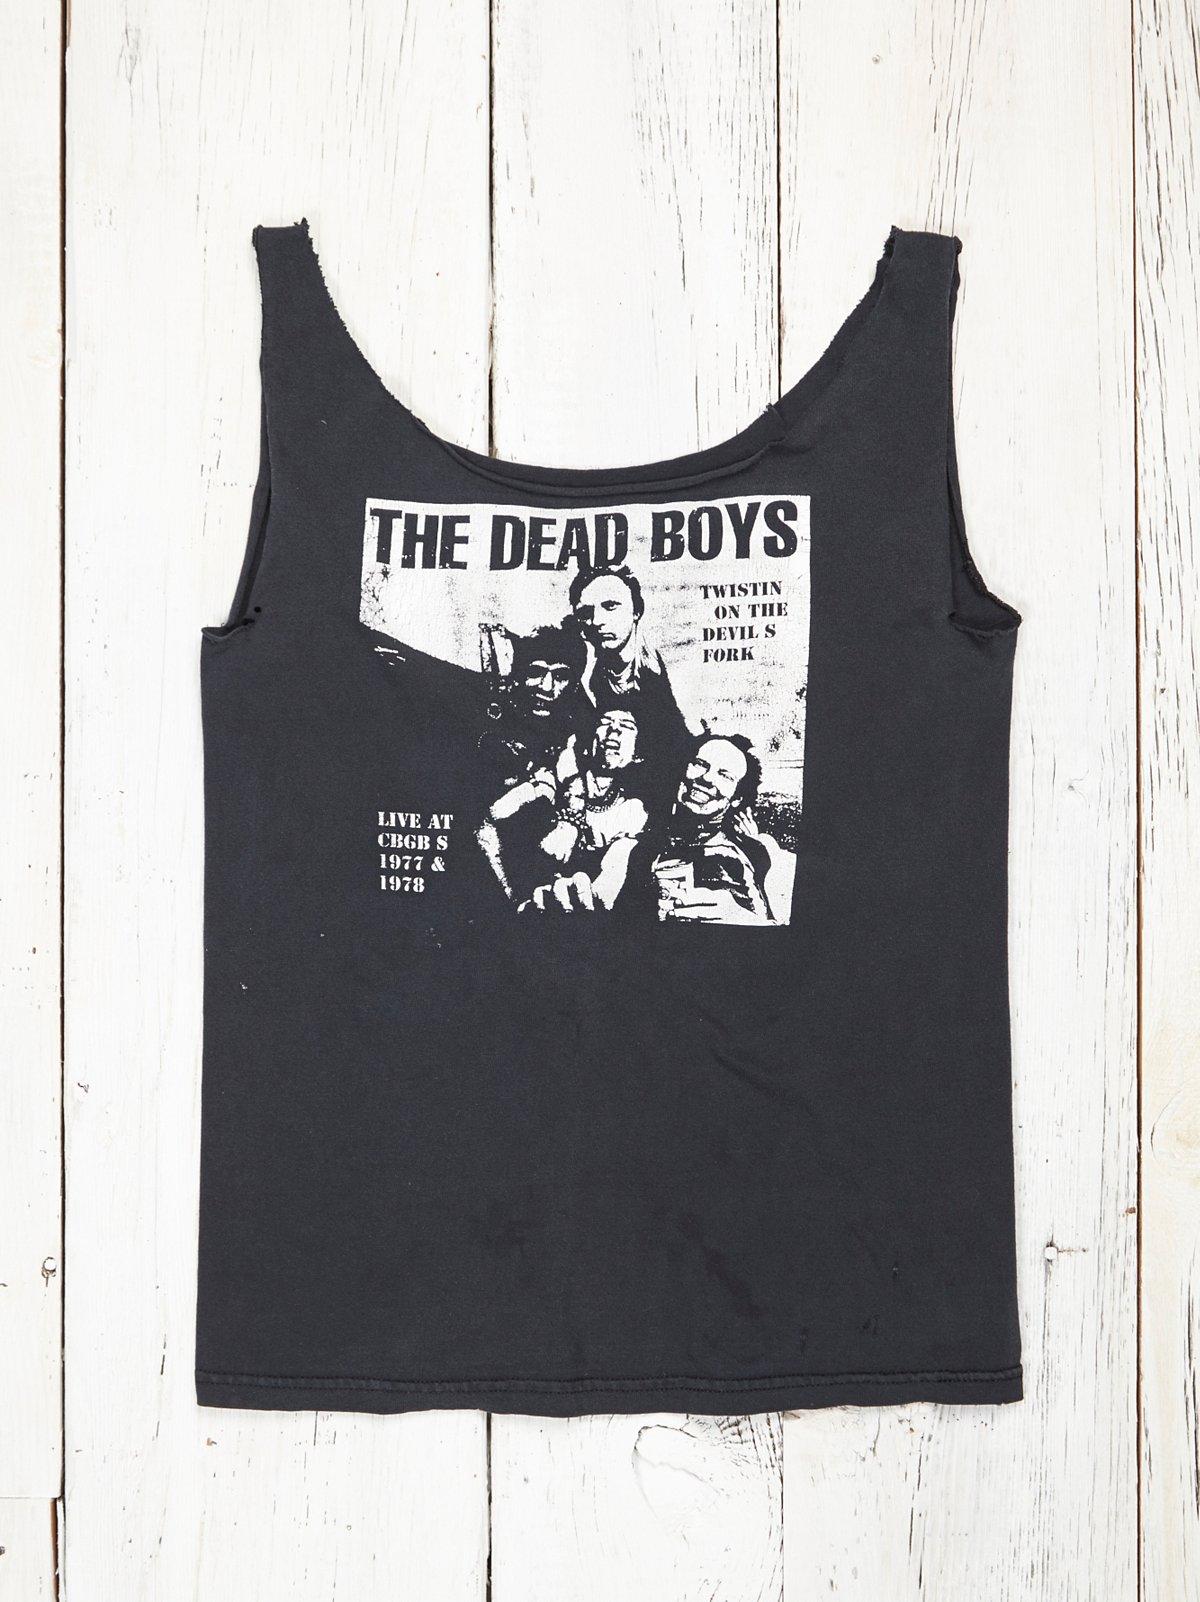 Vintage Dead Boys Band Tee